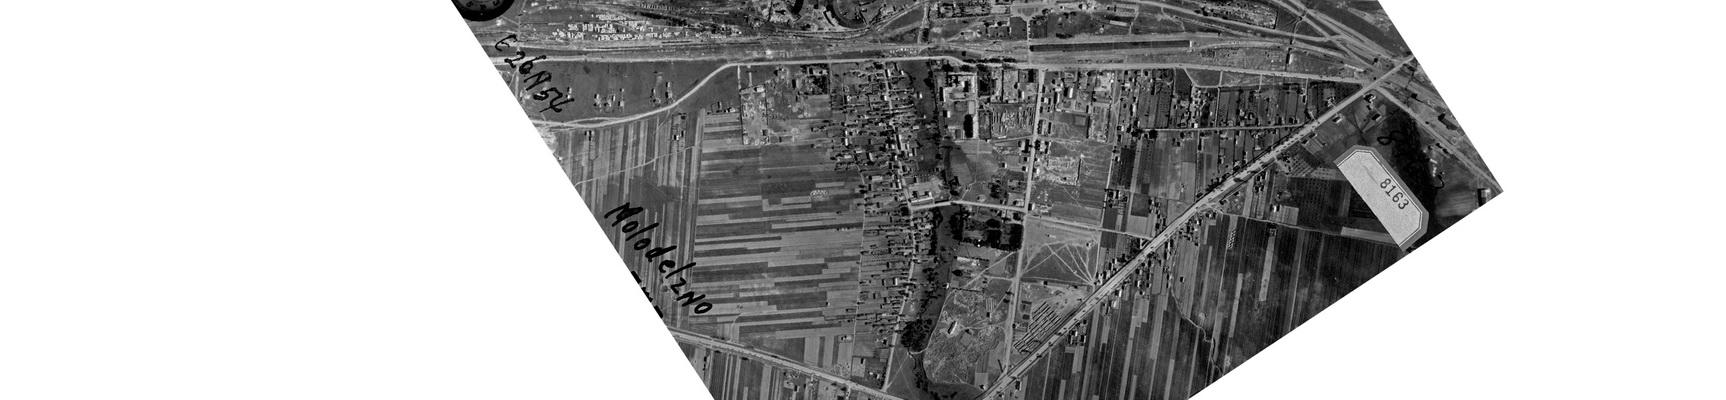 чыгунка 1941 нью net